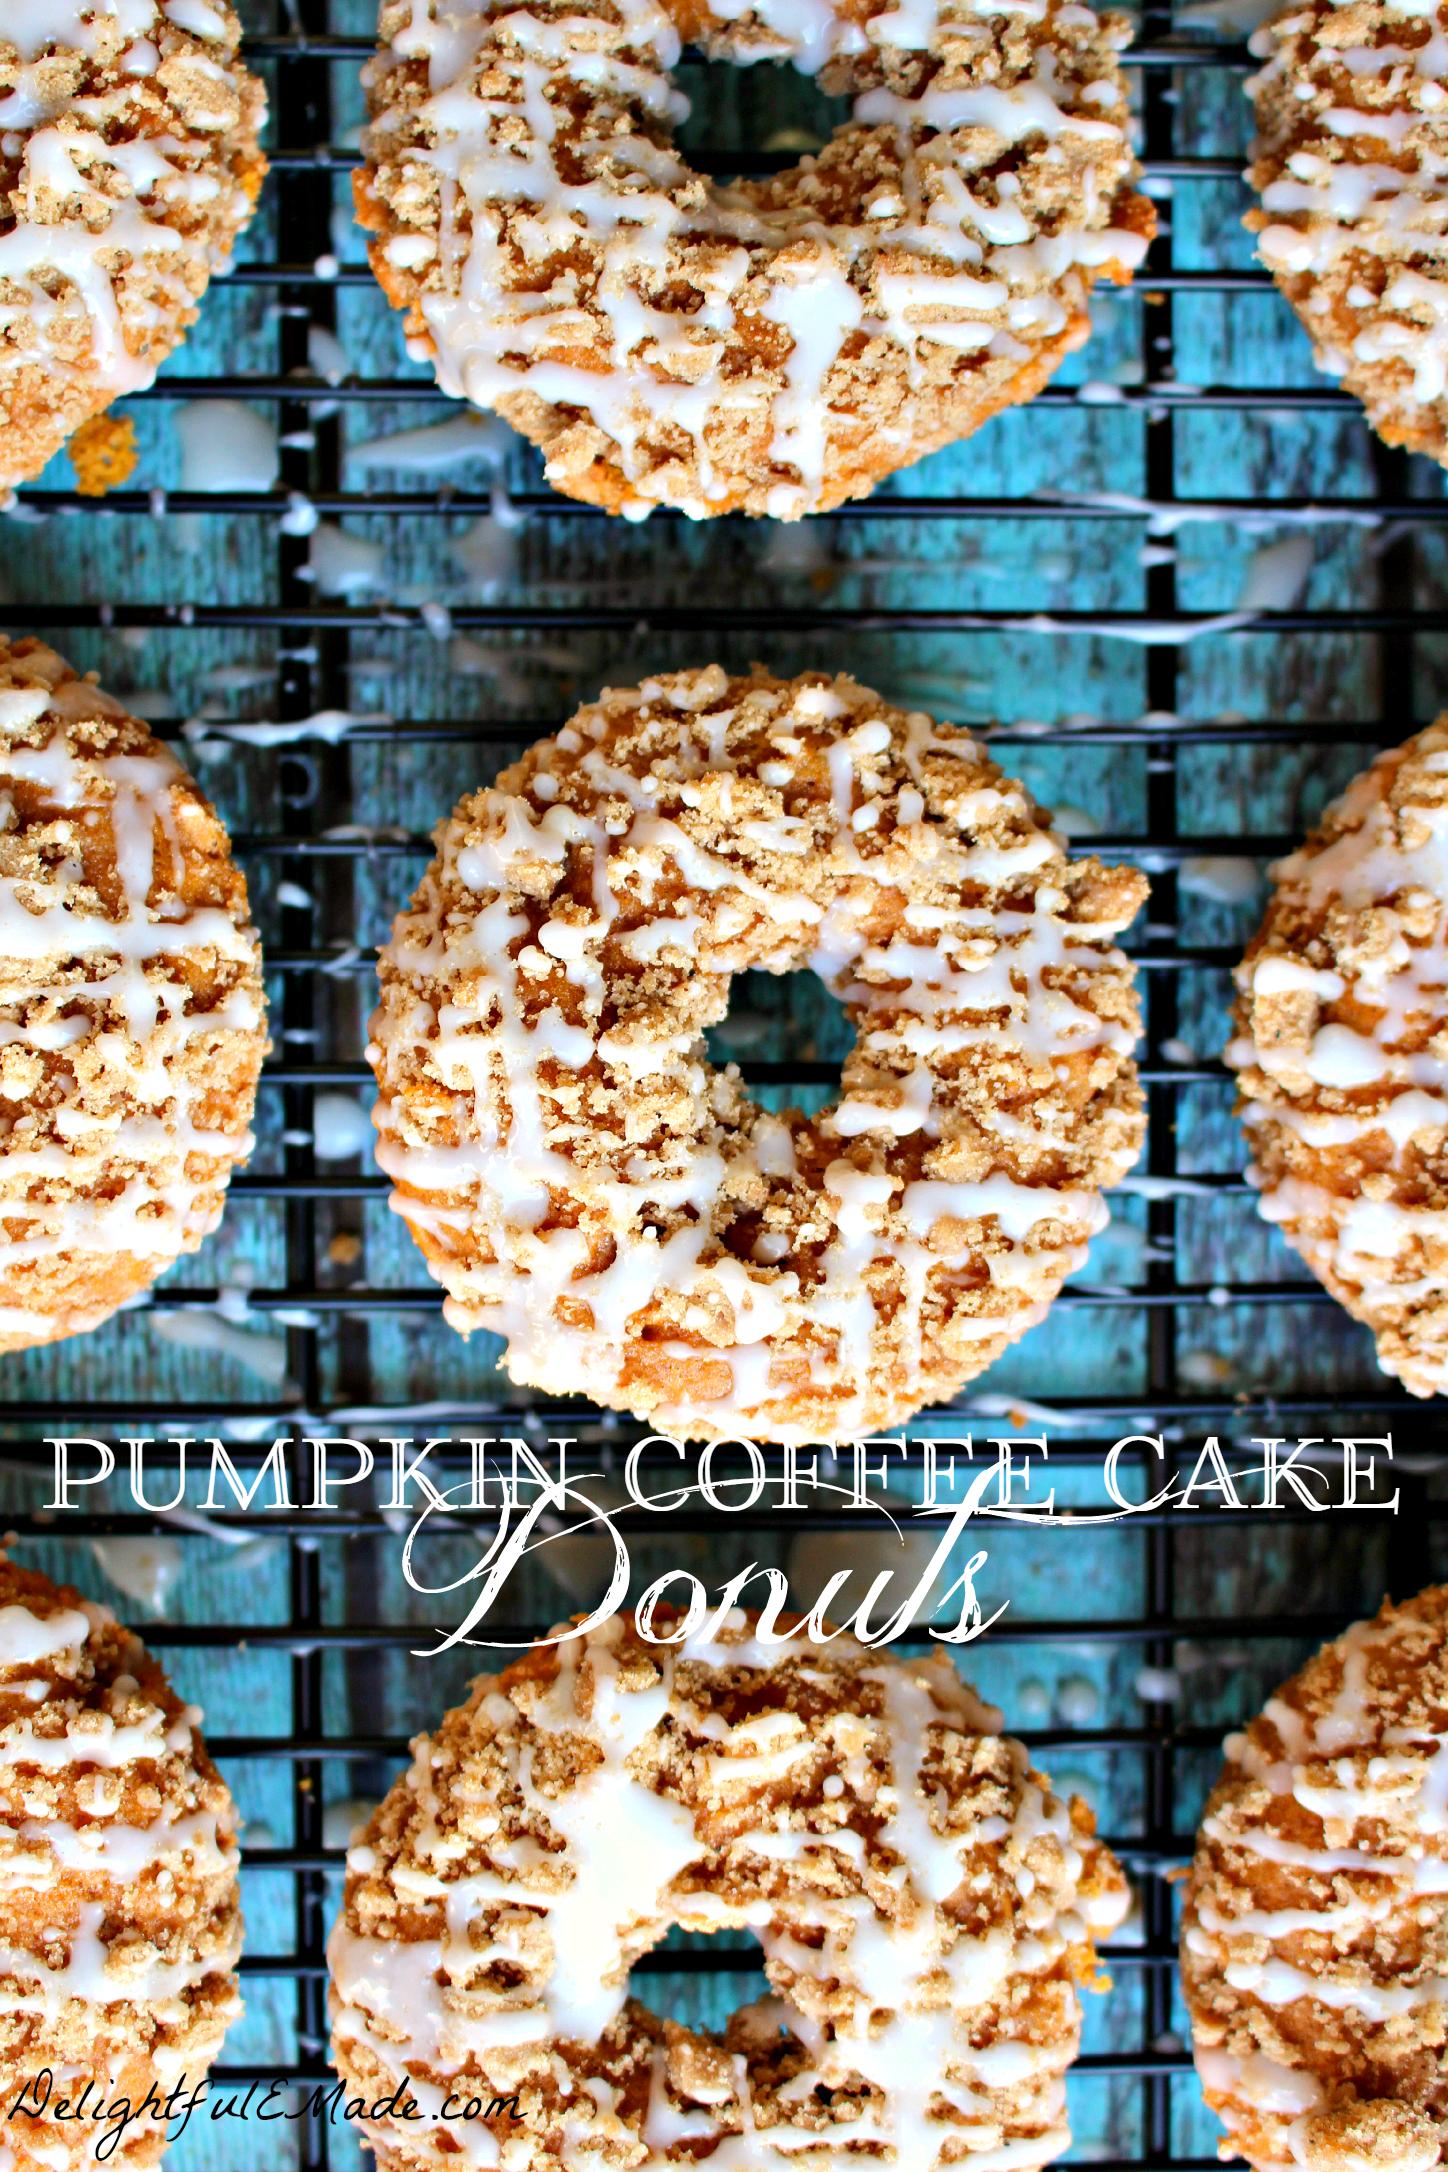 Pumpkin Coffee Cake Donuts by Delightful E Made.com